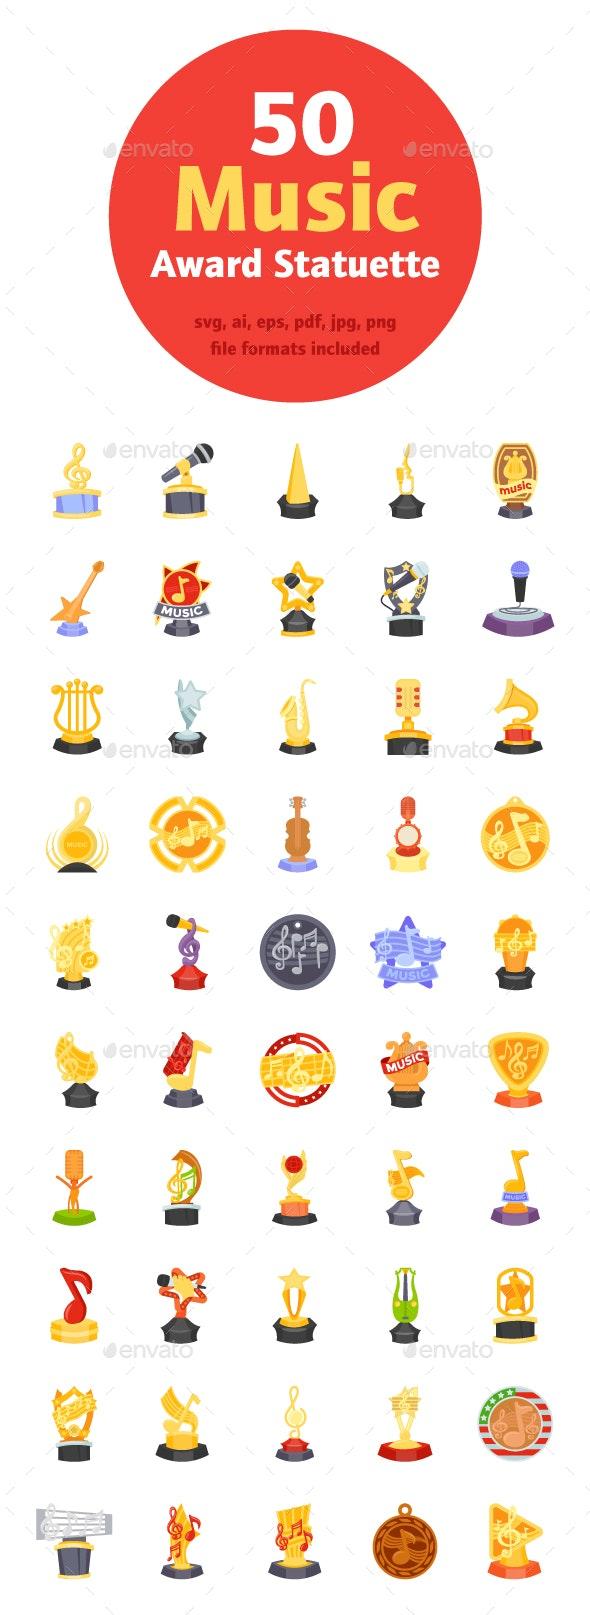 50 Music Award Statuette Vectors - Icons